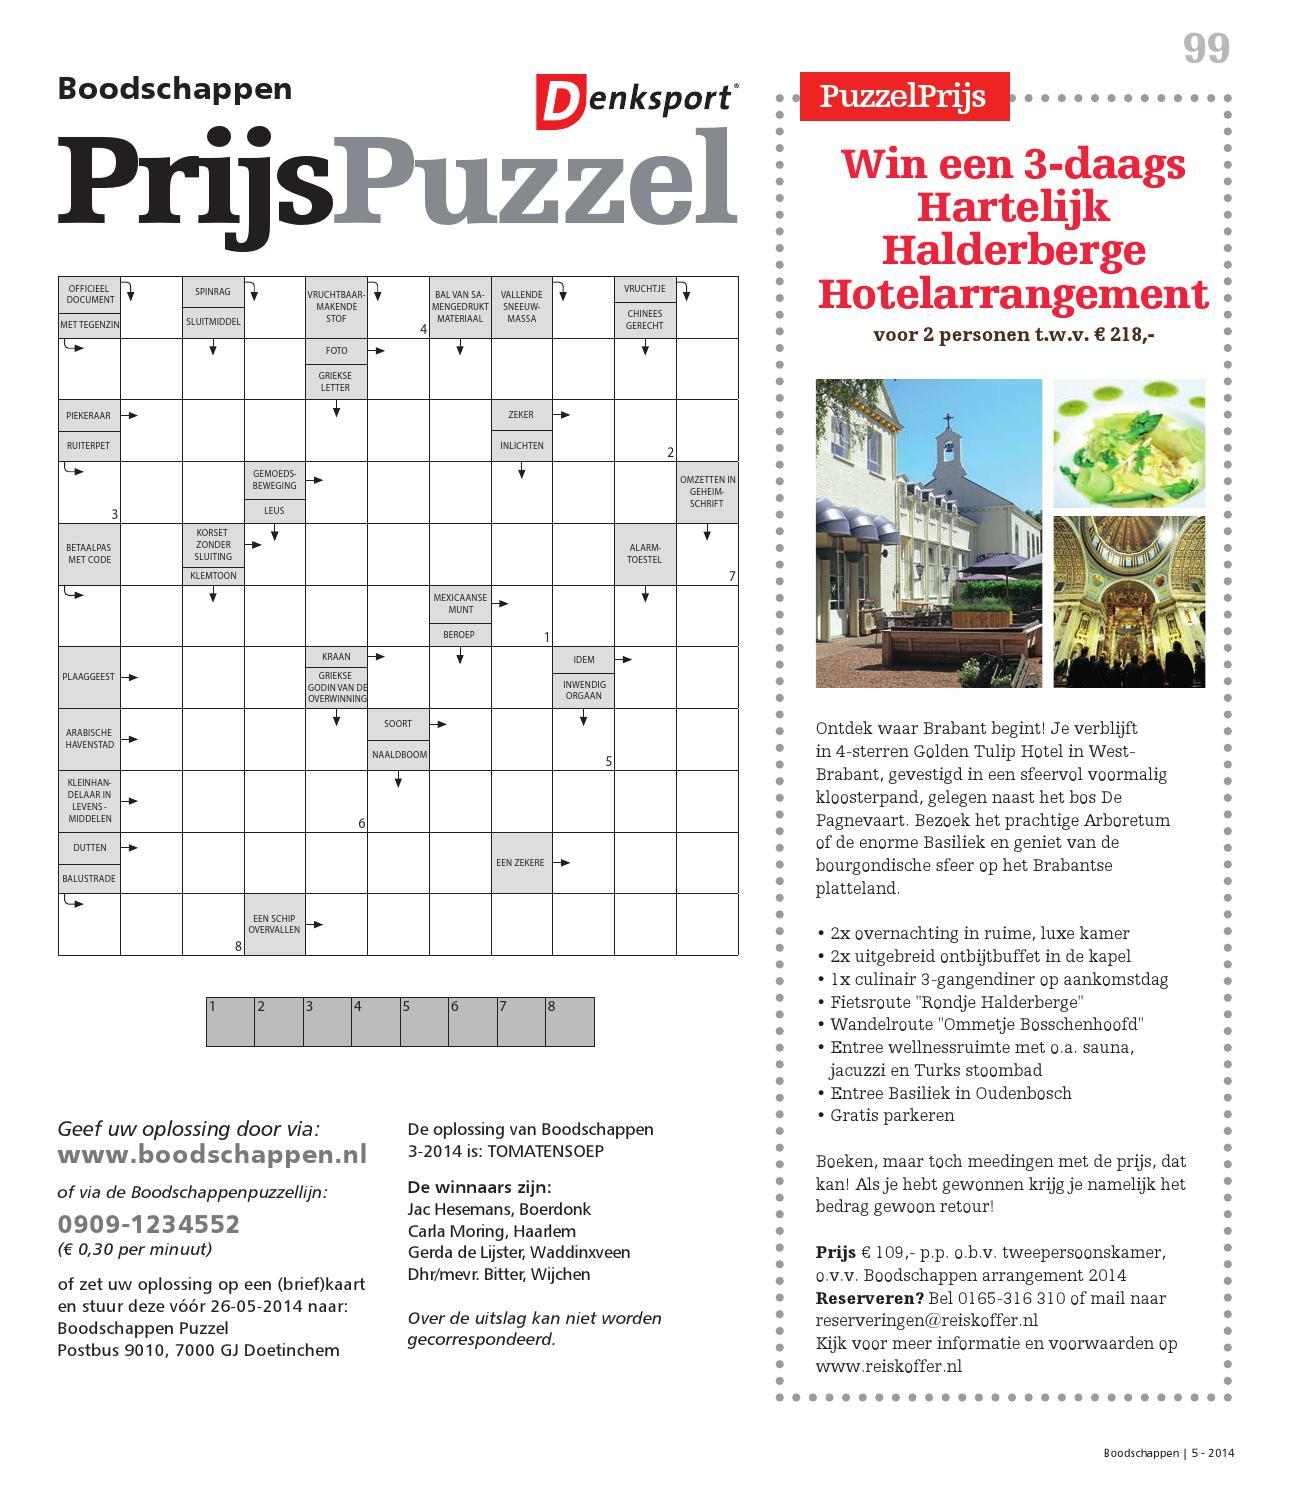 Boodschappen 5 mei 2014 by indicia issuu for Arabische havenstad